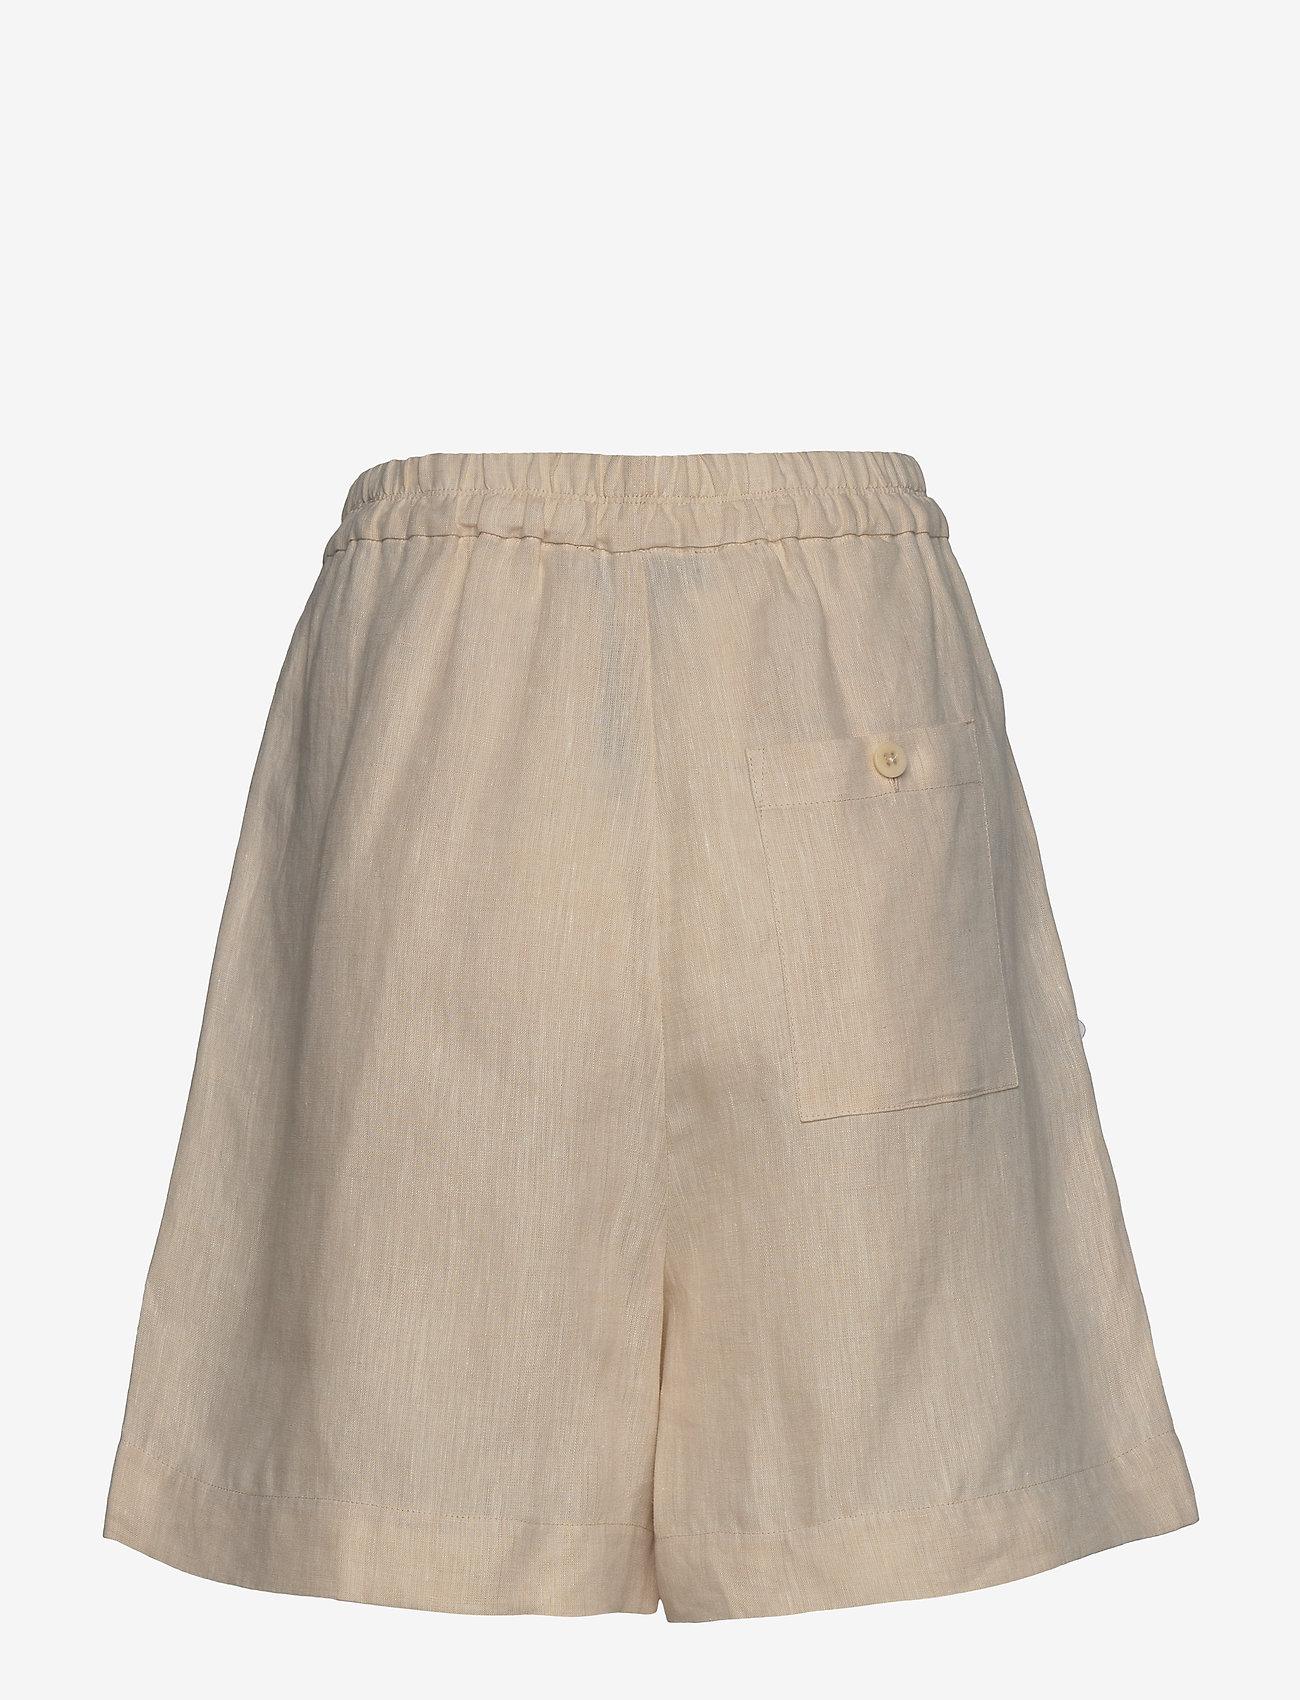 Noa Noa - Shorts - casual korte broeken - natural linen - 1